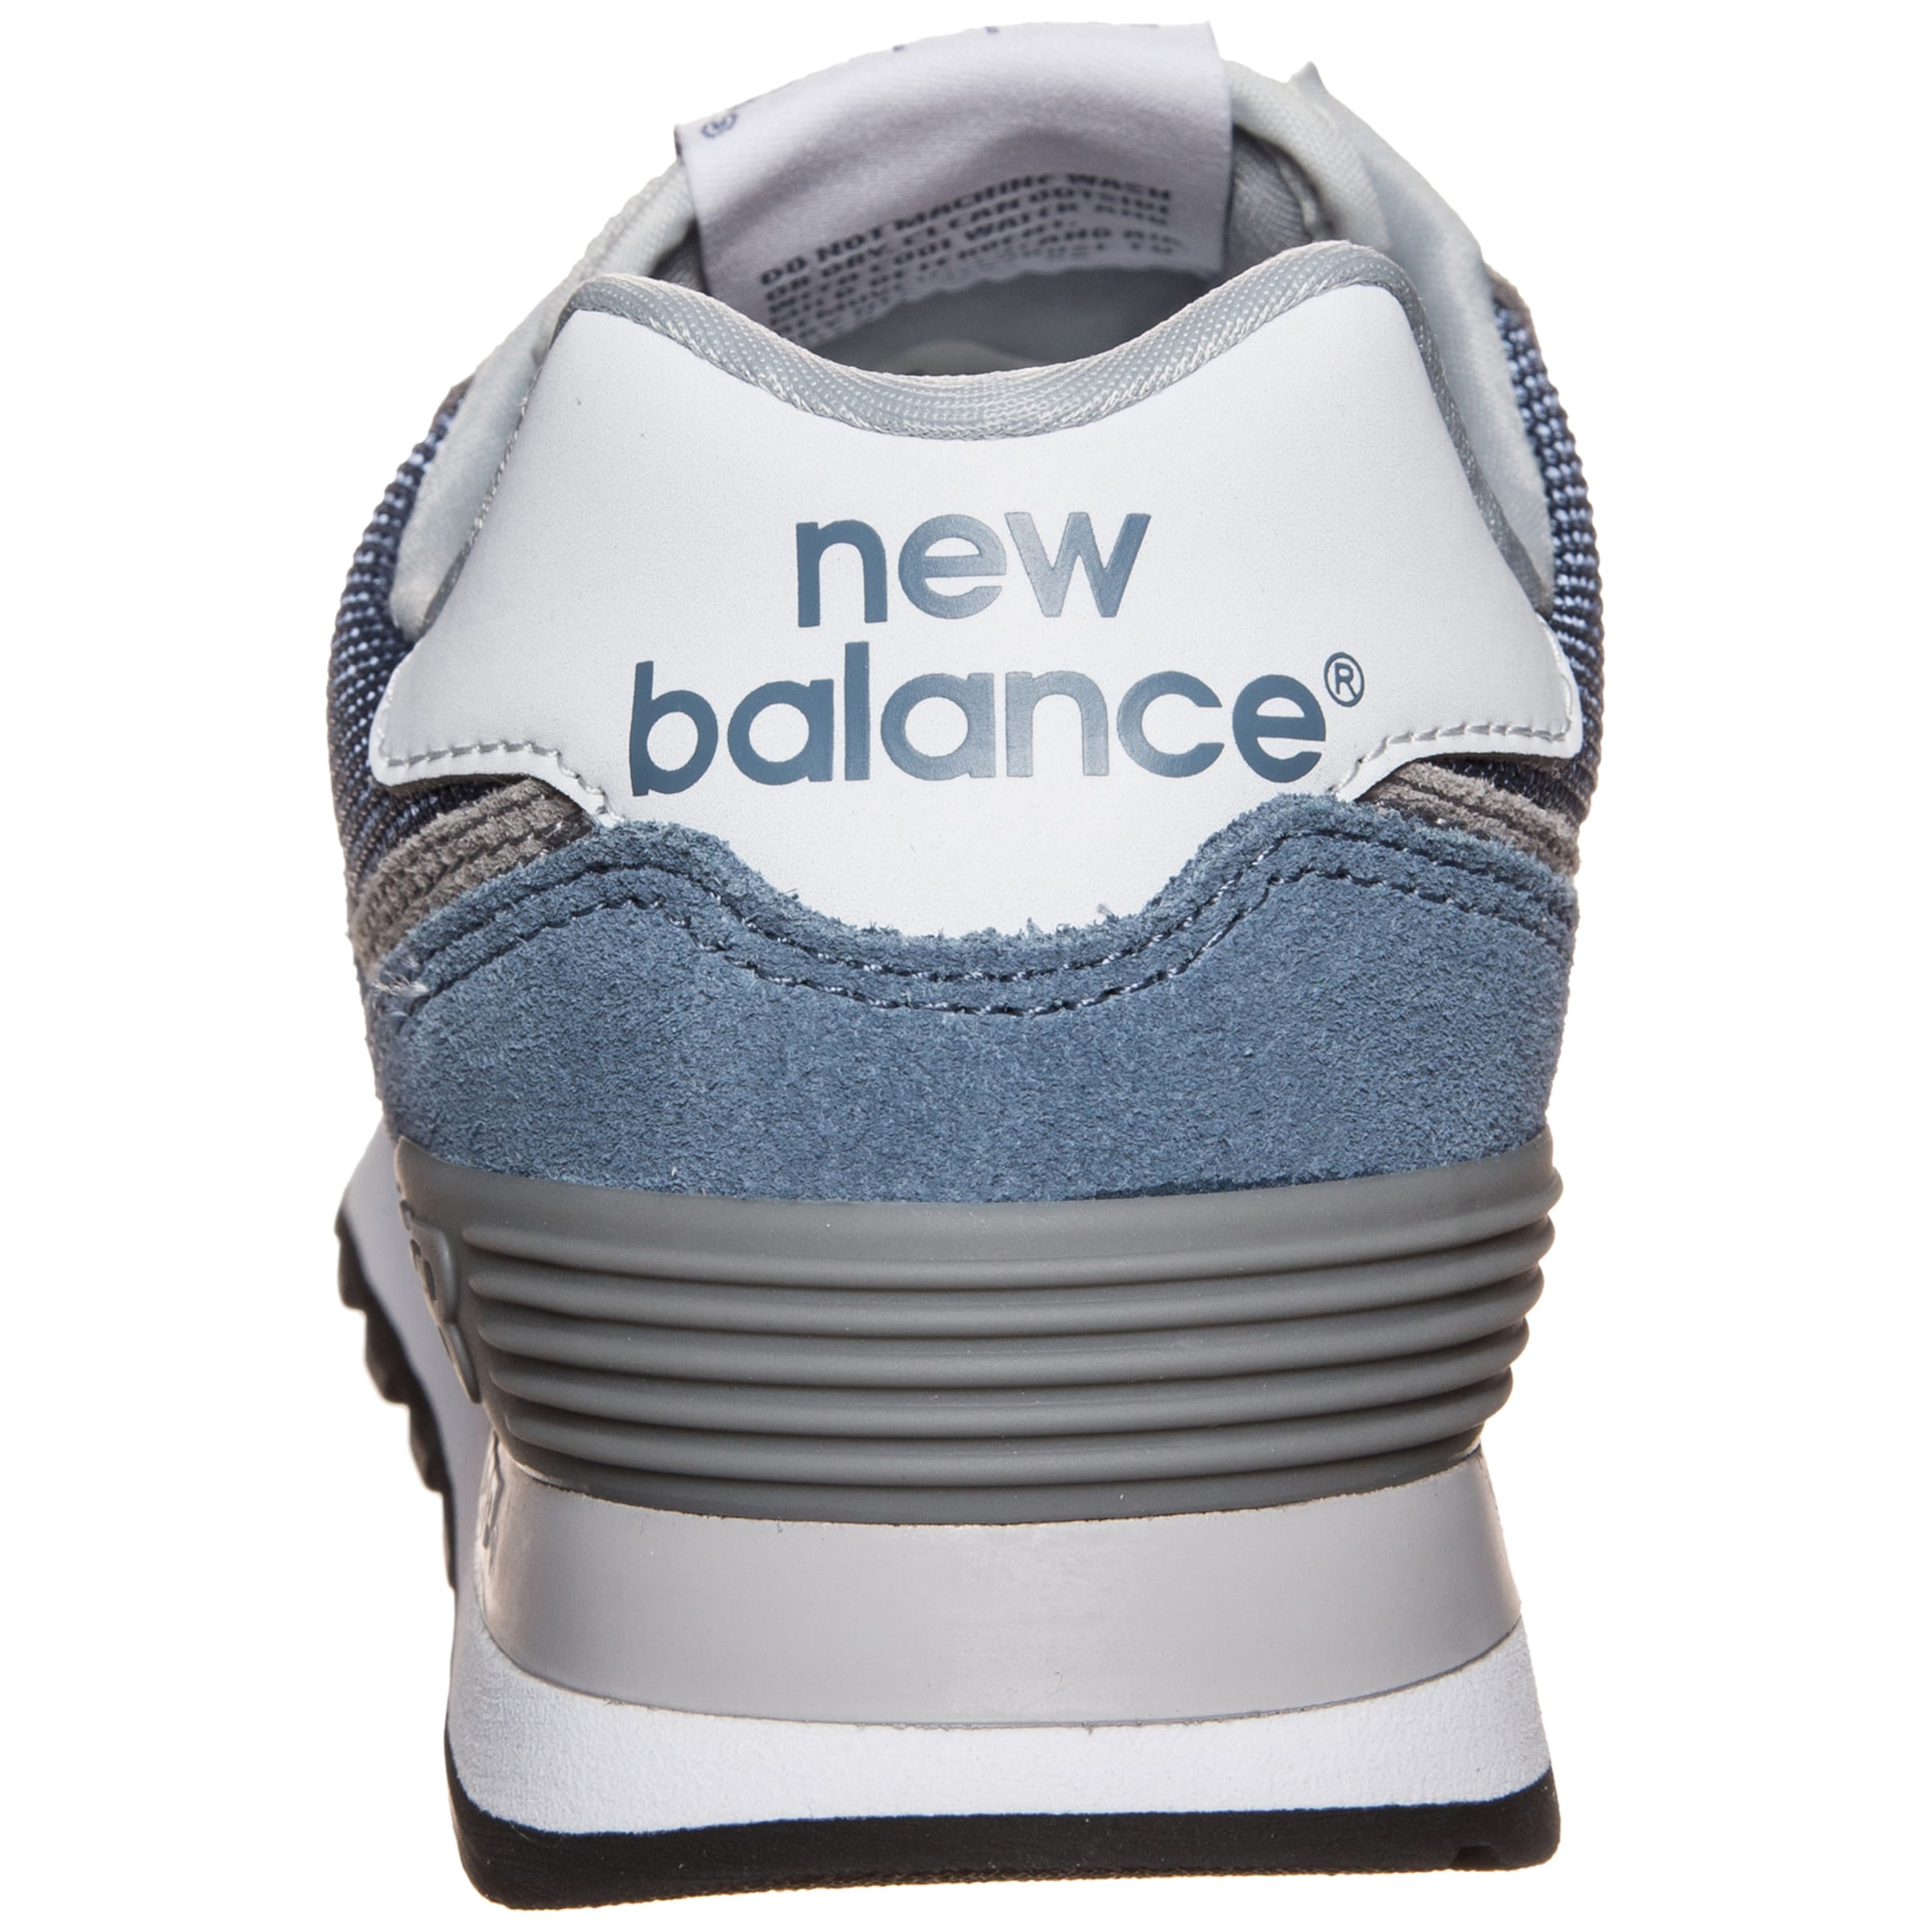 new balance 'WL574-CC-B' Sneaker Damen Erscheinungsdaten Online NEZshgq53